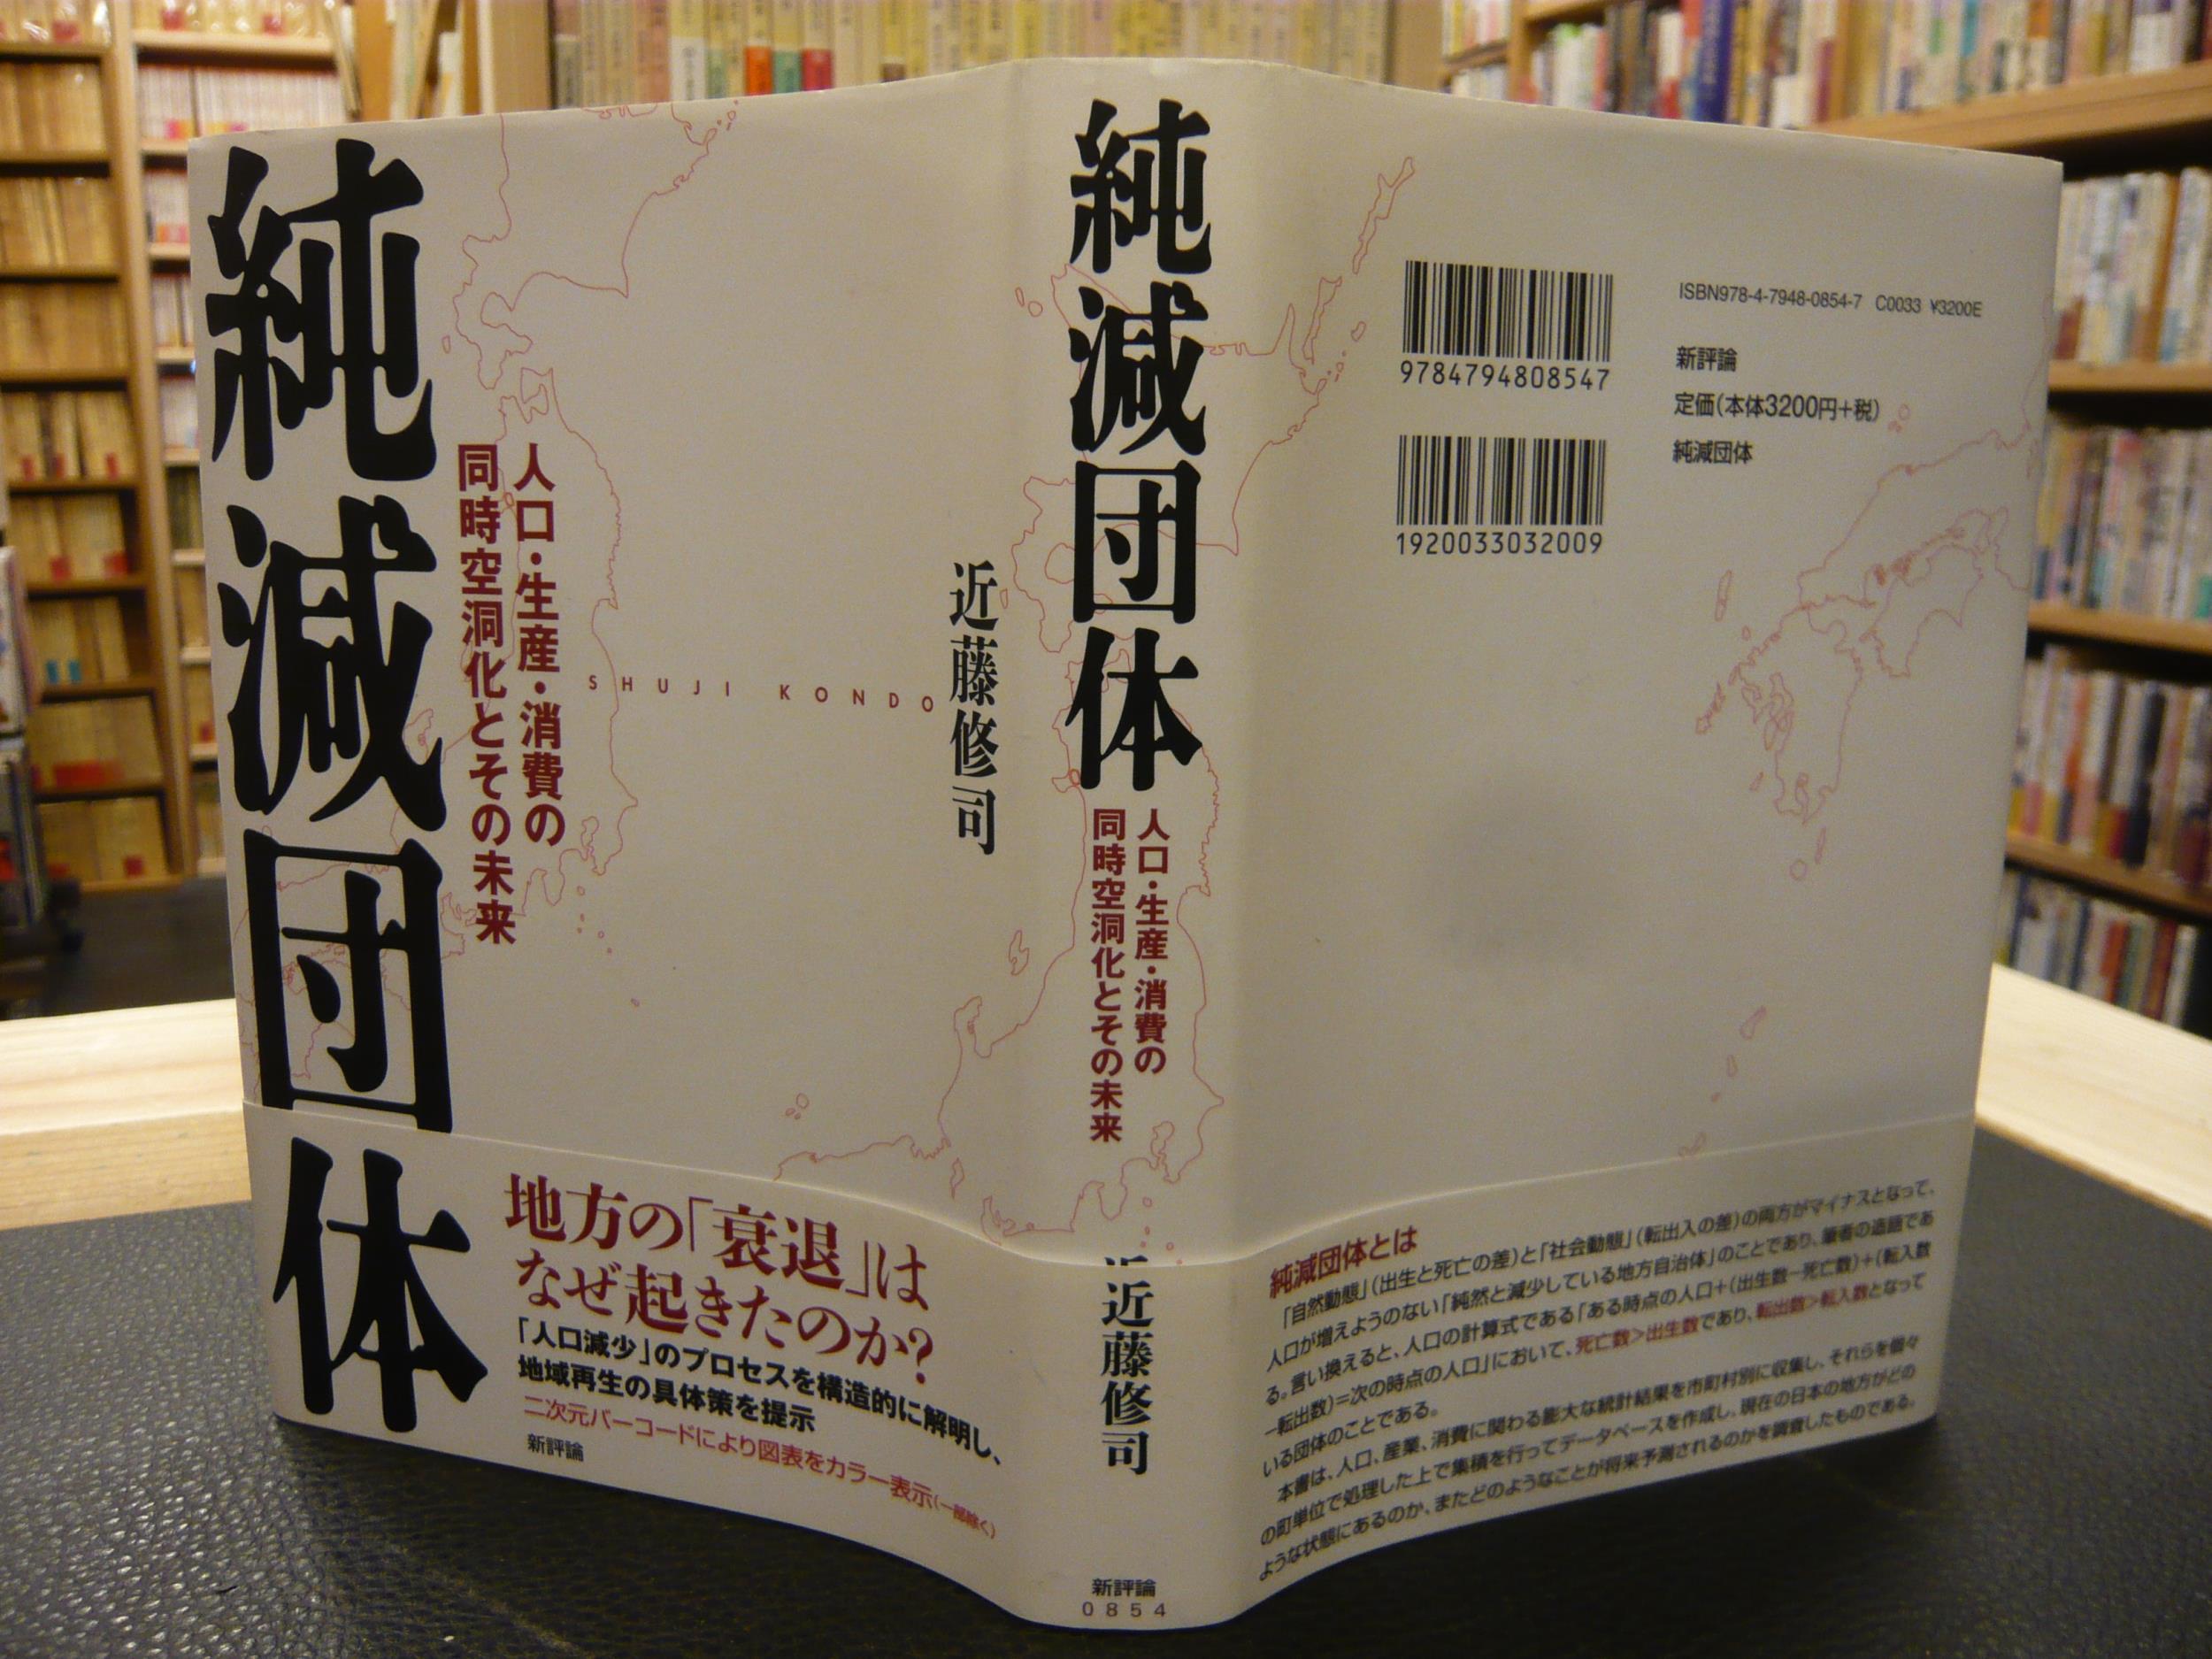 純減団体」 人口・生産・消費の同時空洞化とその未来(近藤修司 著 ...